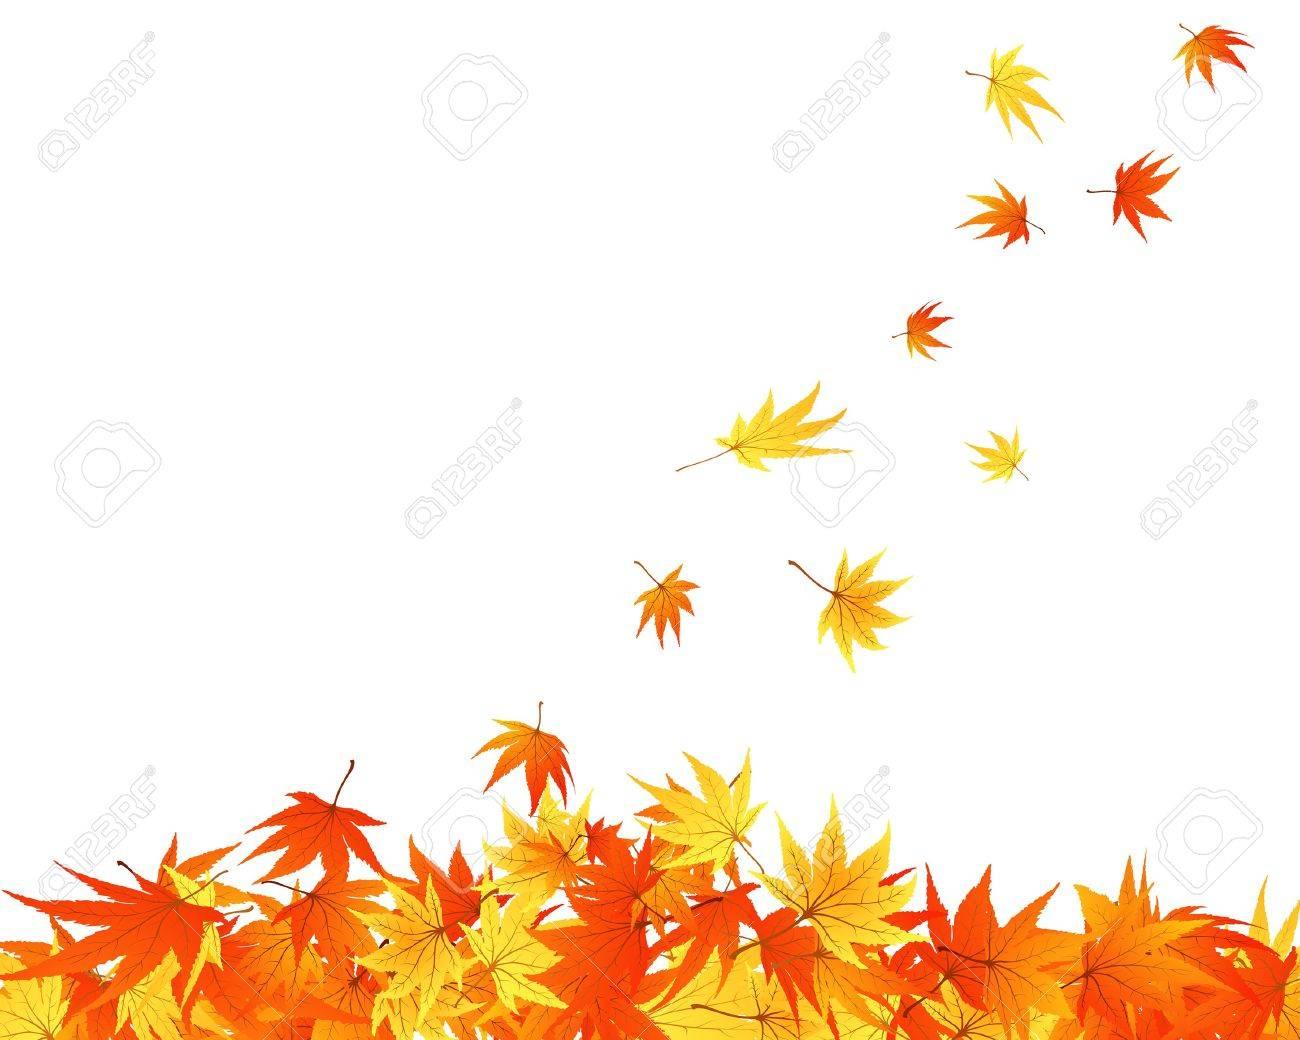 Pattern of autumn  maples leaves.  illustration. Stock Vector - 7685225